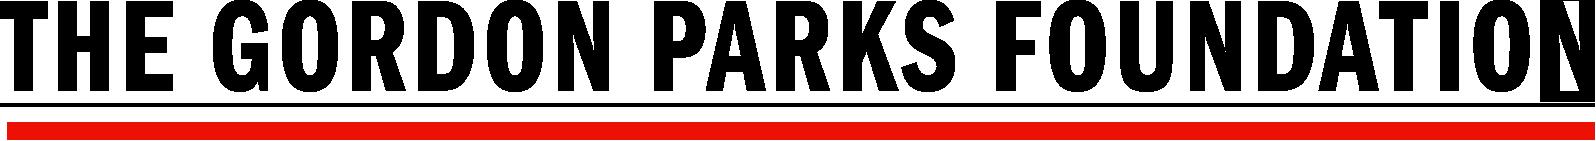 Gordon Parks Foundation